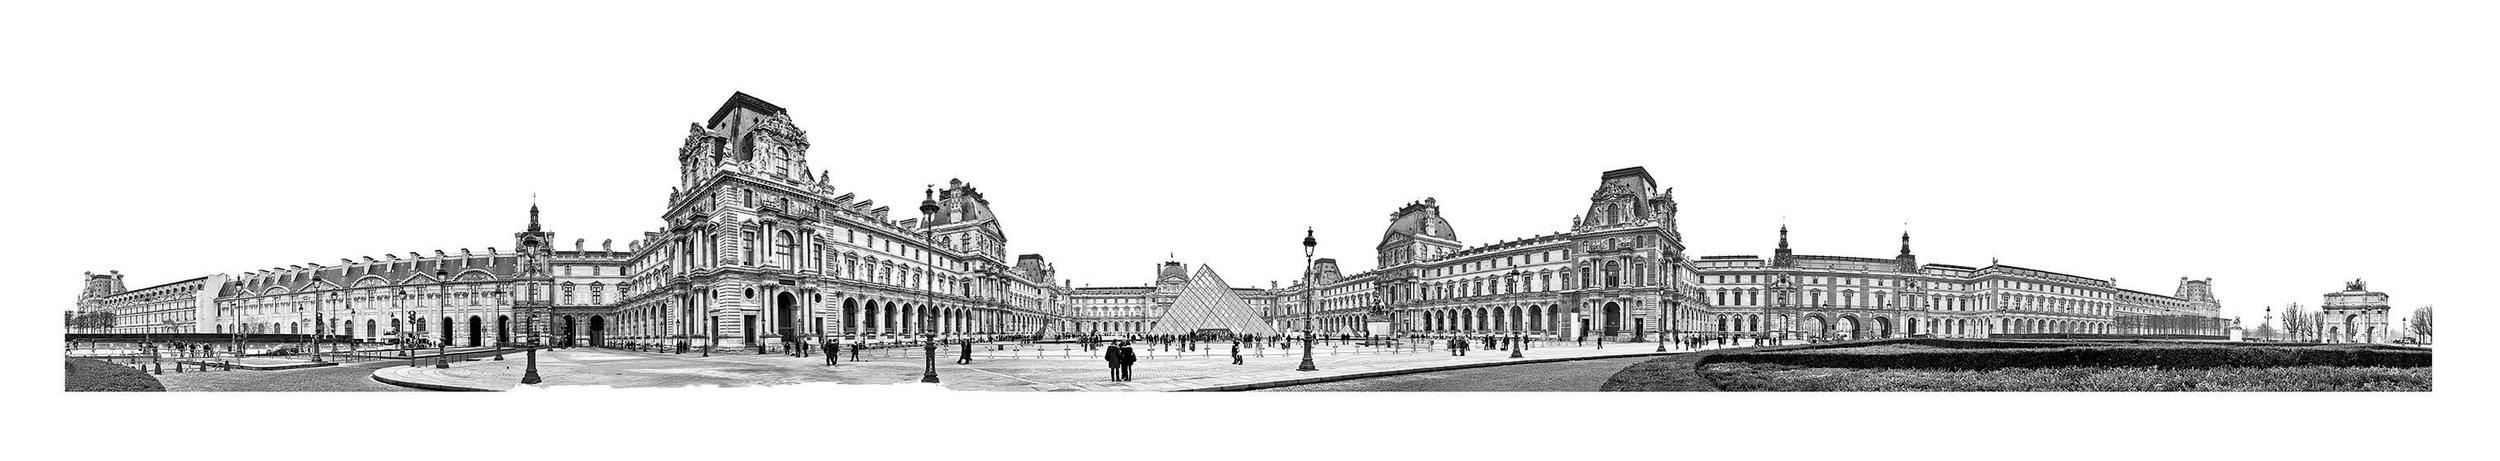 JW_Louvre_Composite_42%22x7.75 CMYK copy.jpg